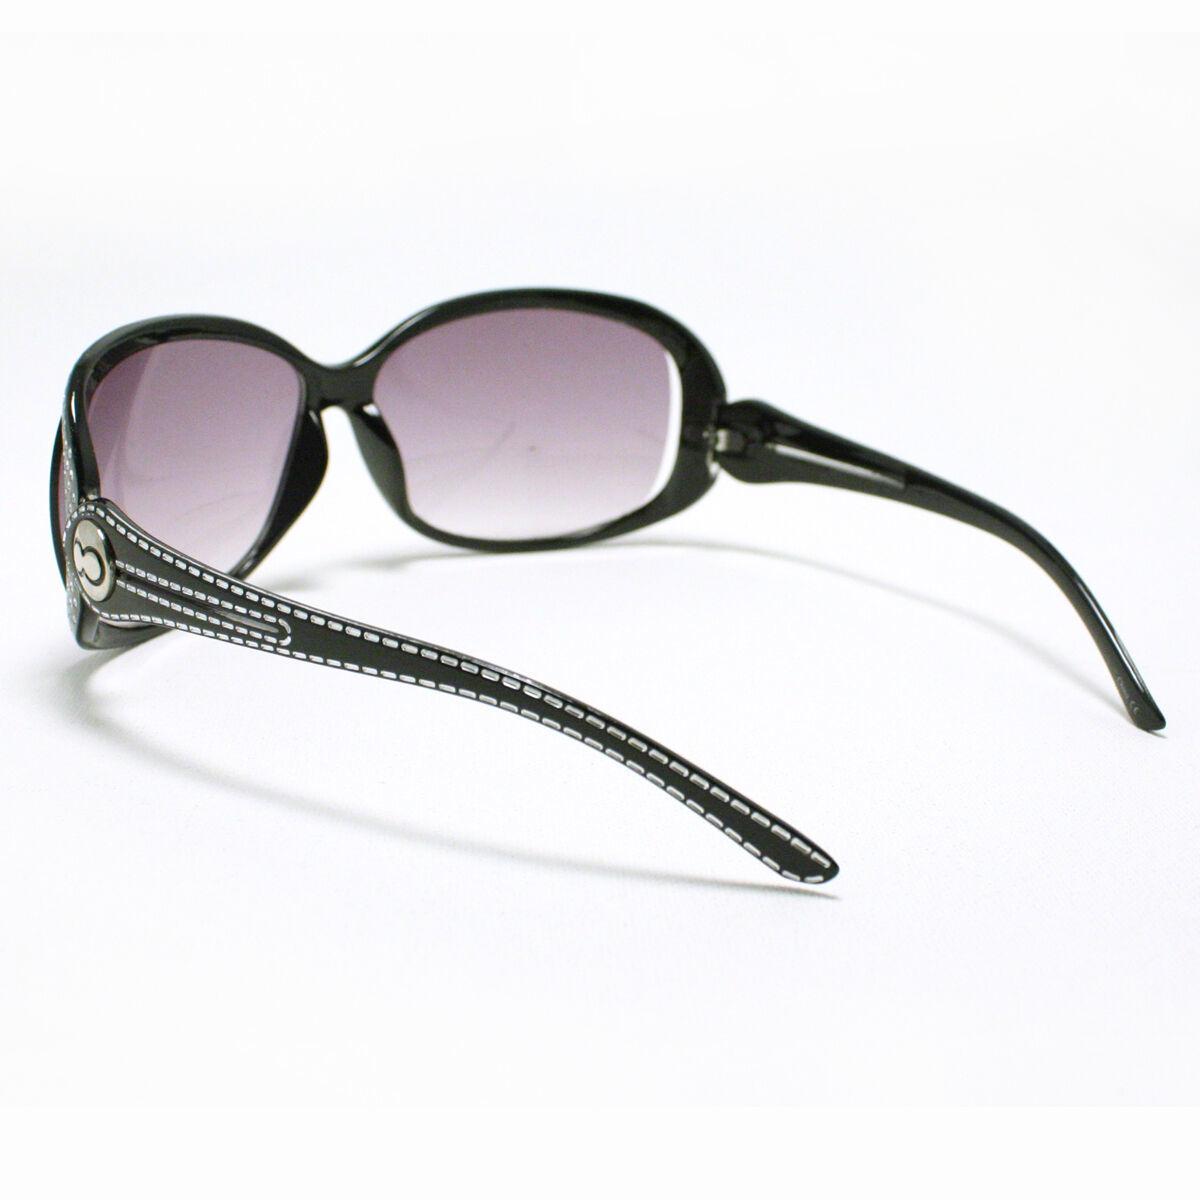 Womens Oversized Sunglasses Round Unique Designer Frame BLACK